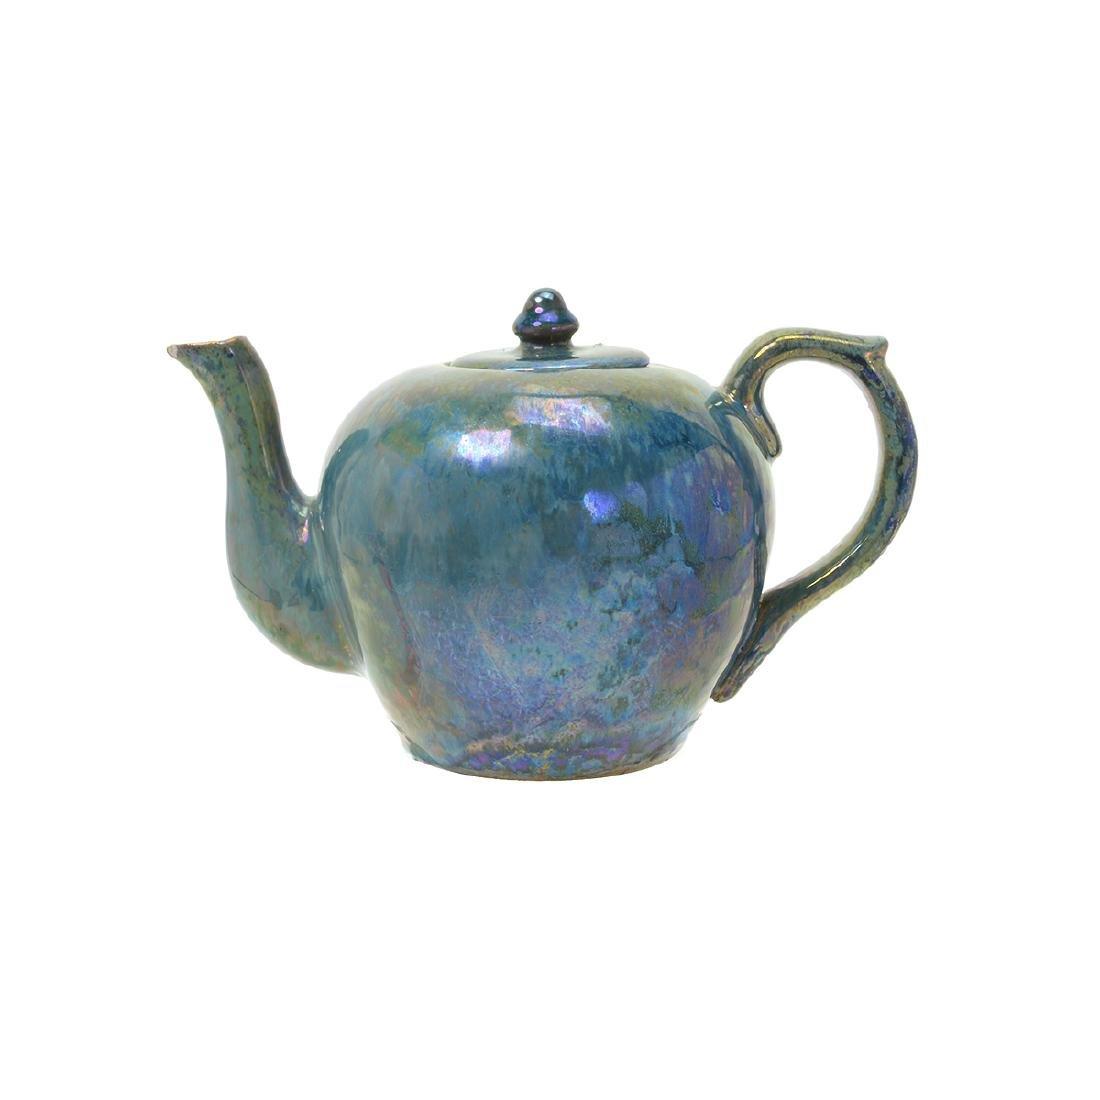 Alphonse Cytere Iridescent Art Pottery Tea Service - 2